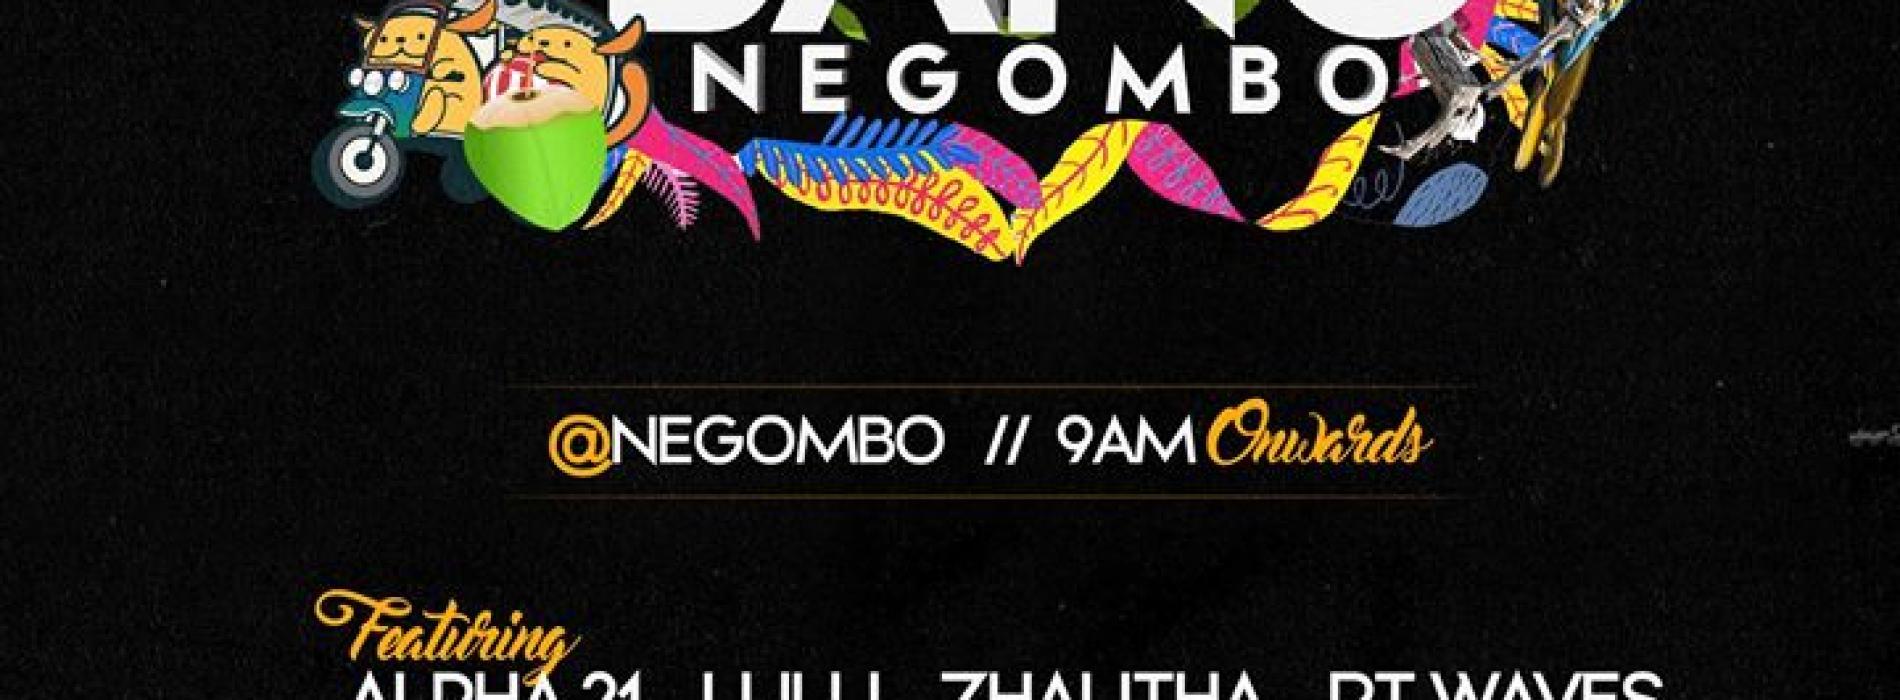 BANG BANG – Negombo!